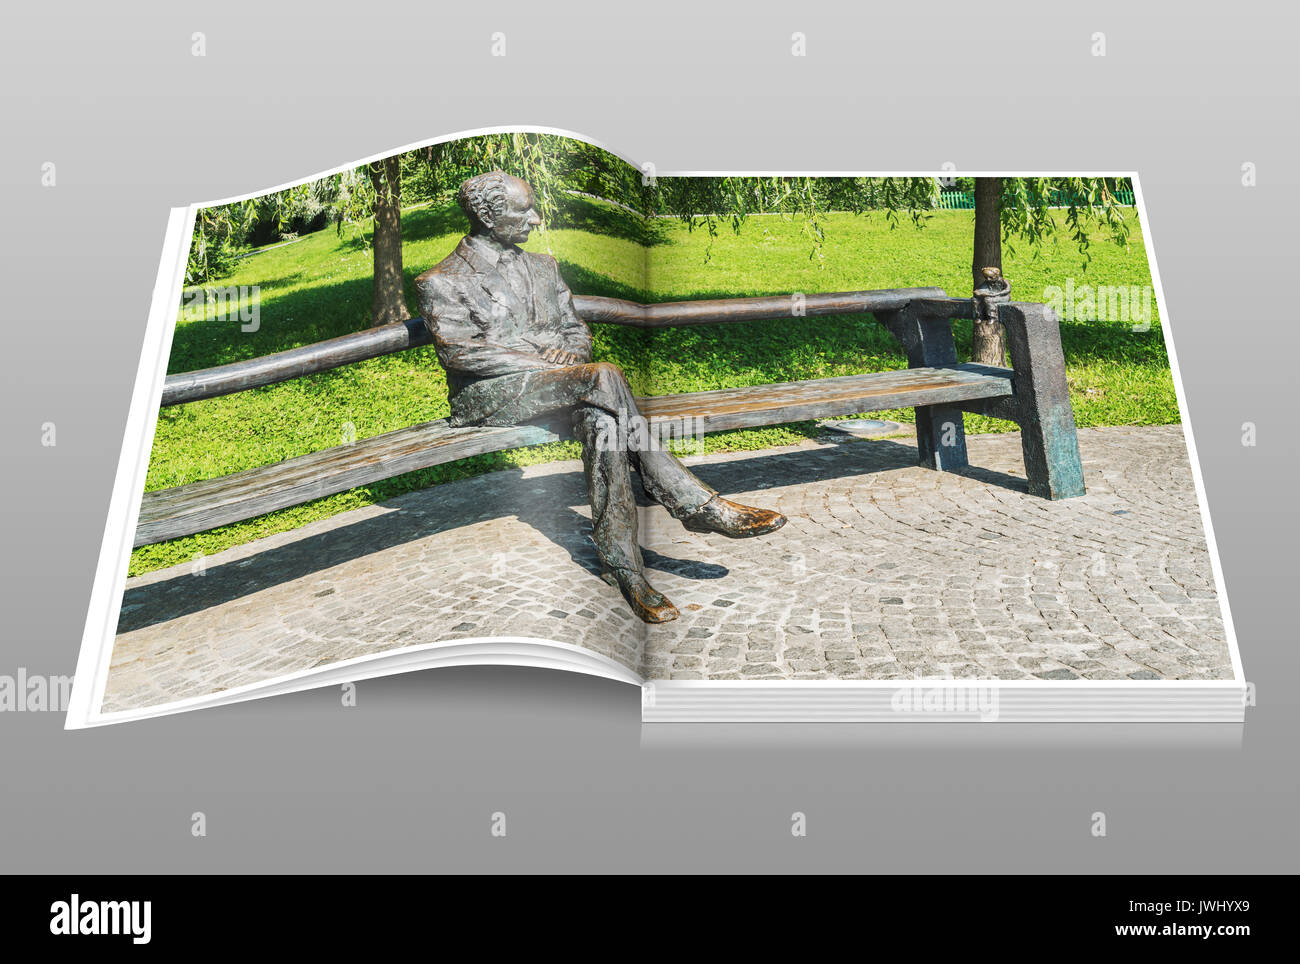 The statue of Edvard Kocbek is located in Tivoli Park, Ljubljana, Slovenia, Europe - Stock Image